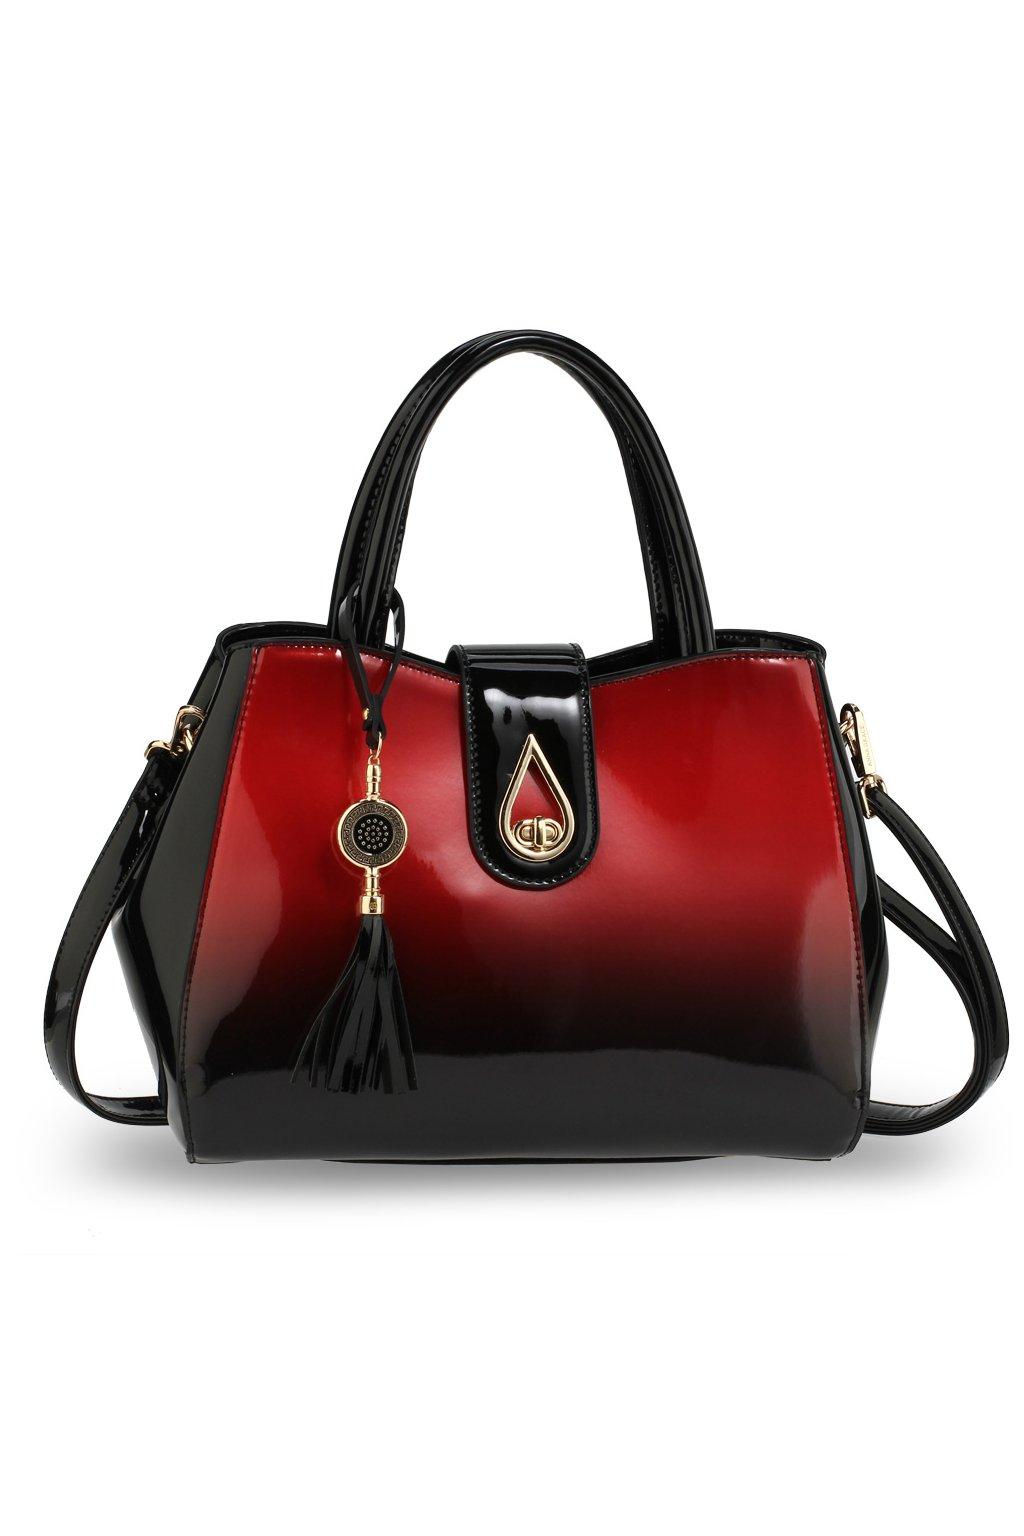 Trendy kabelka do ruky Lilliana červená AG00650 d9ca670dde8